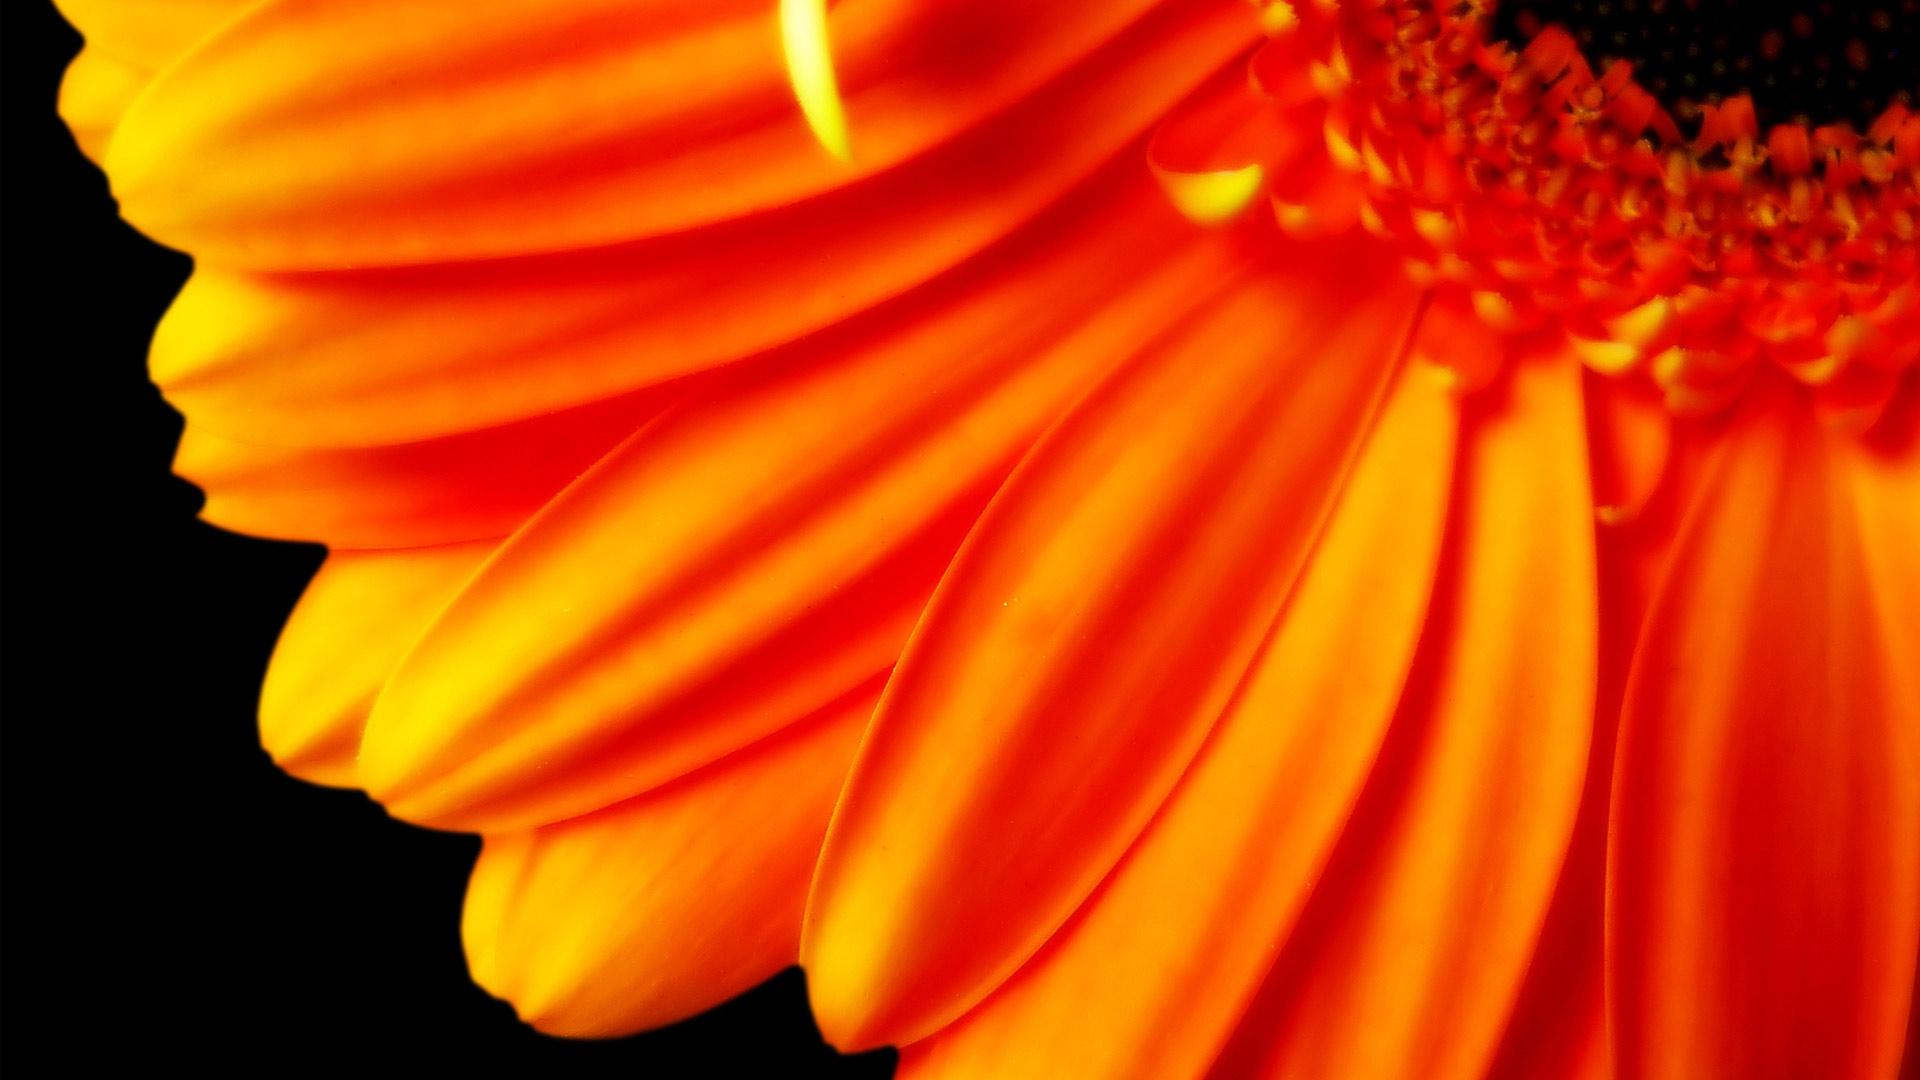 Pure Orange Flower 1080p Hd Wallpaper